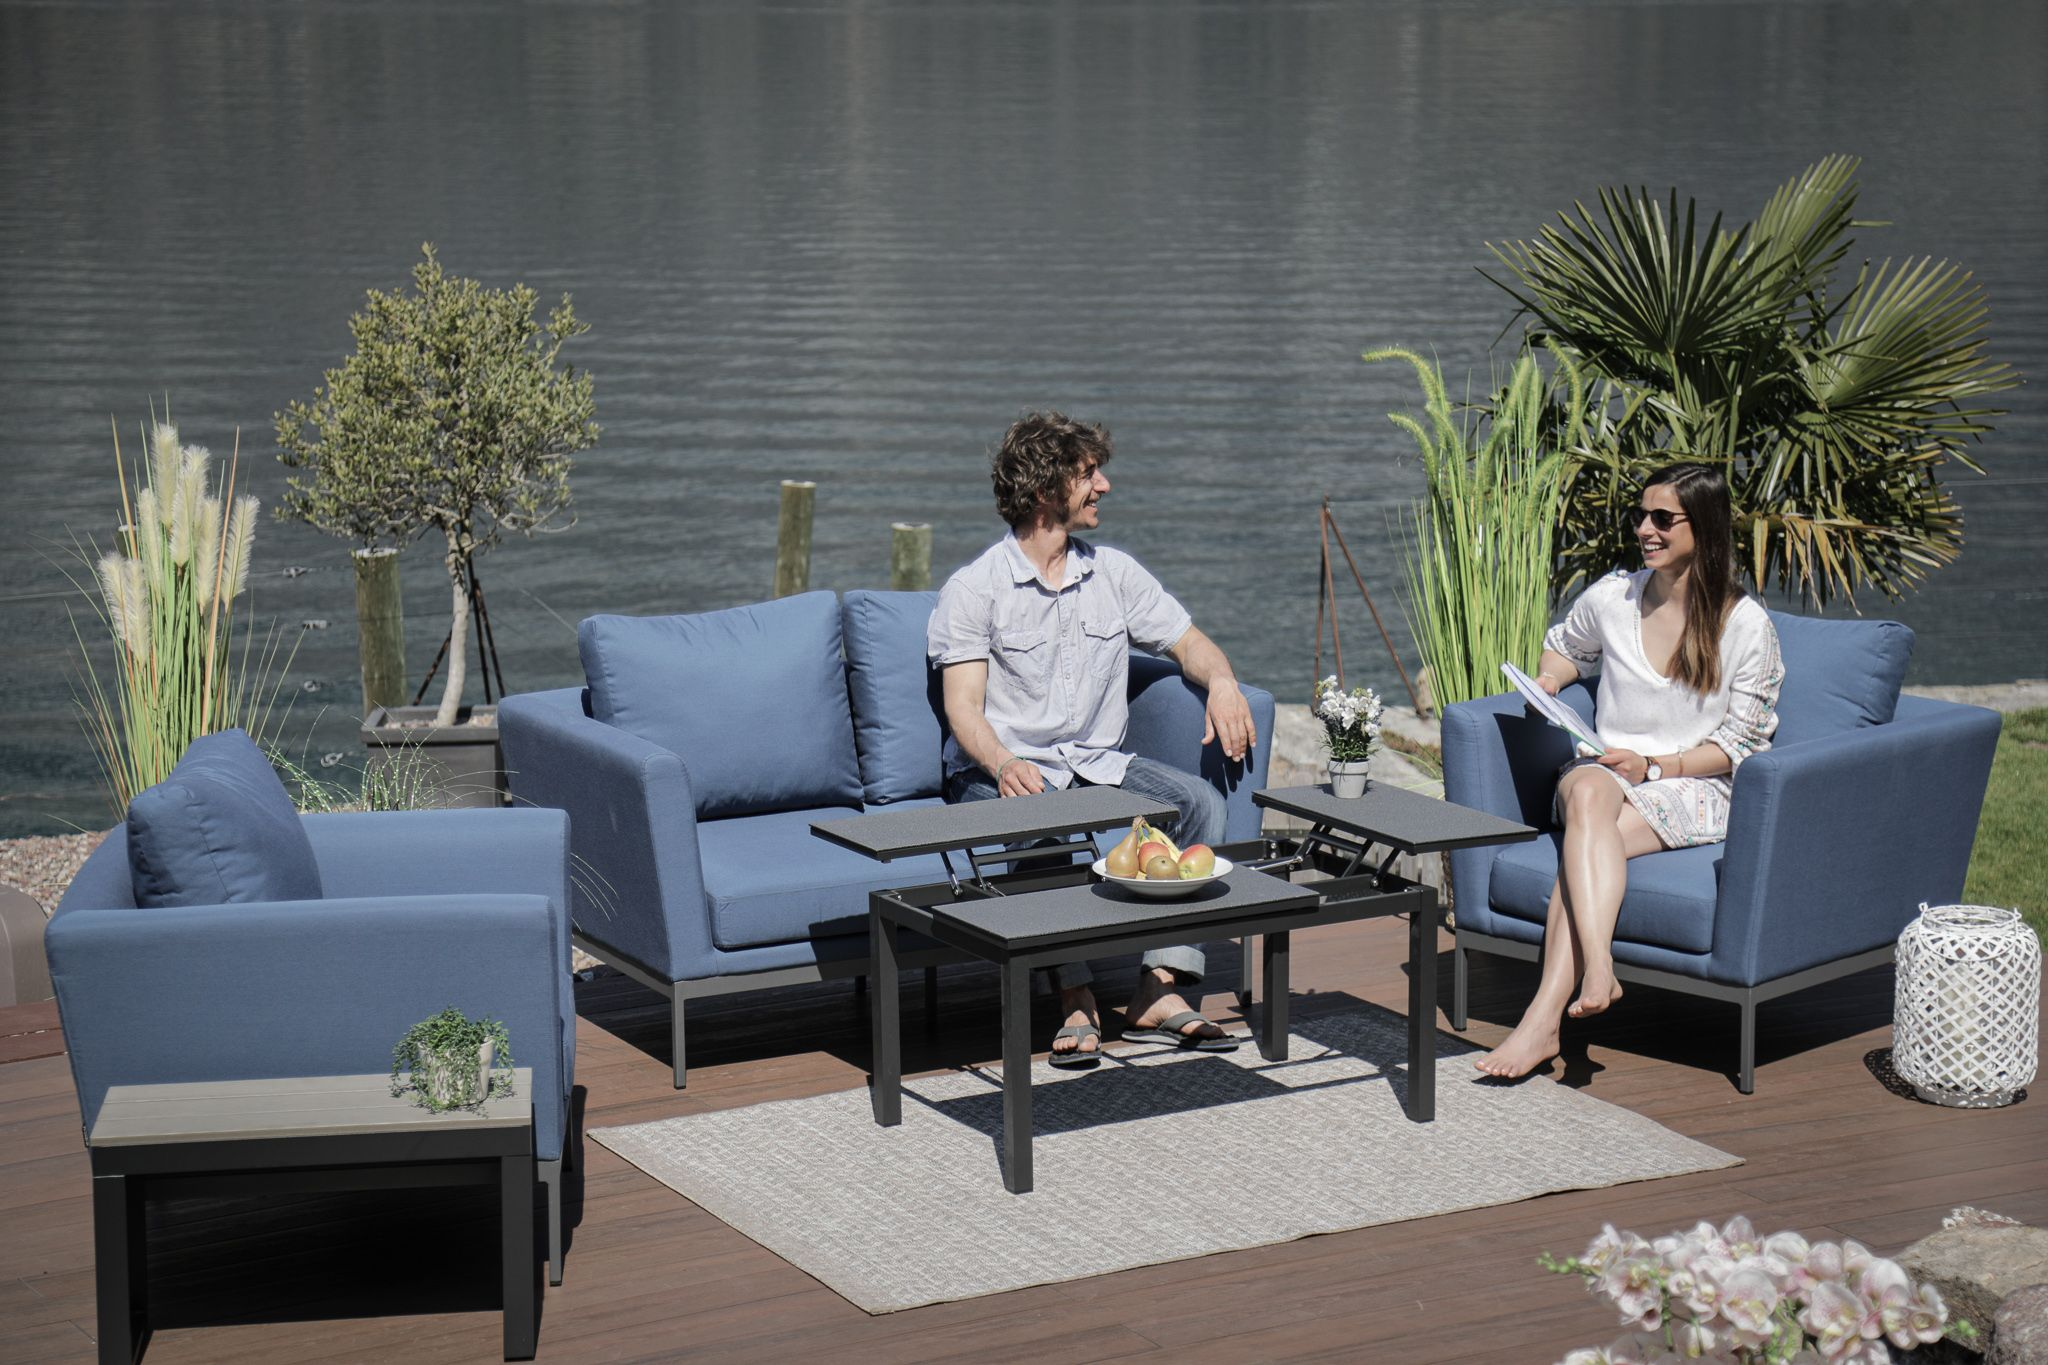 Galaxy Sunbrella Lounge Set Bluestorm Kaufen Viplounge Lounge Mobel Gartenmobel Outdoor Lounge